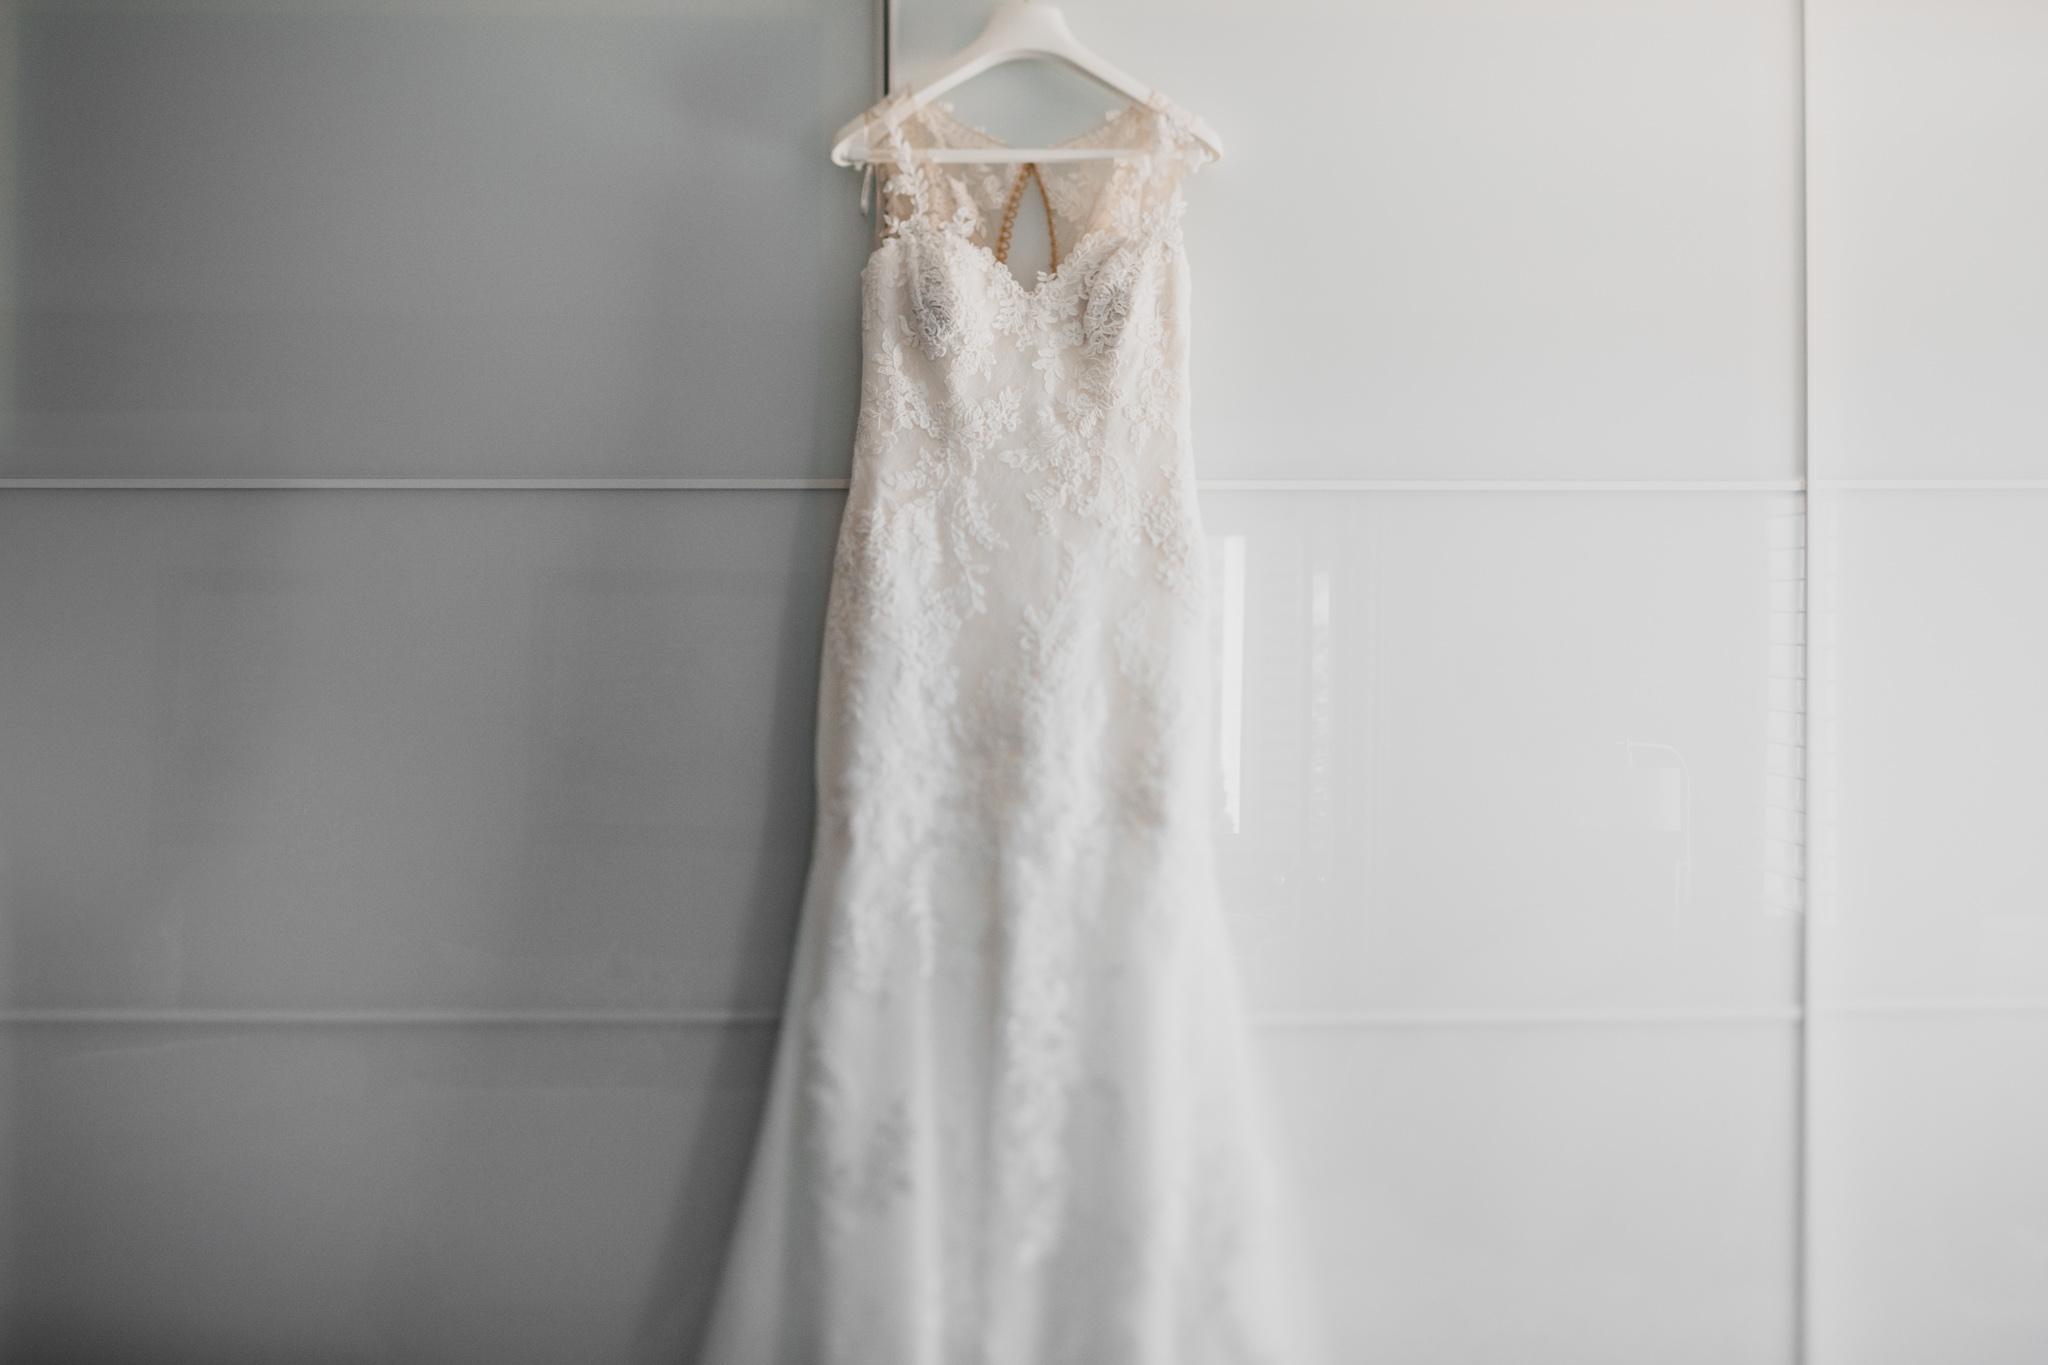 Ottawa Wedding Dress, With Love